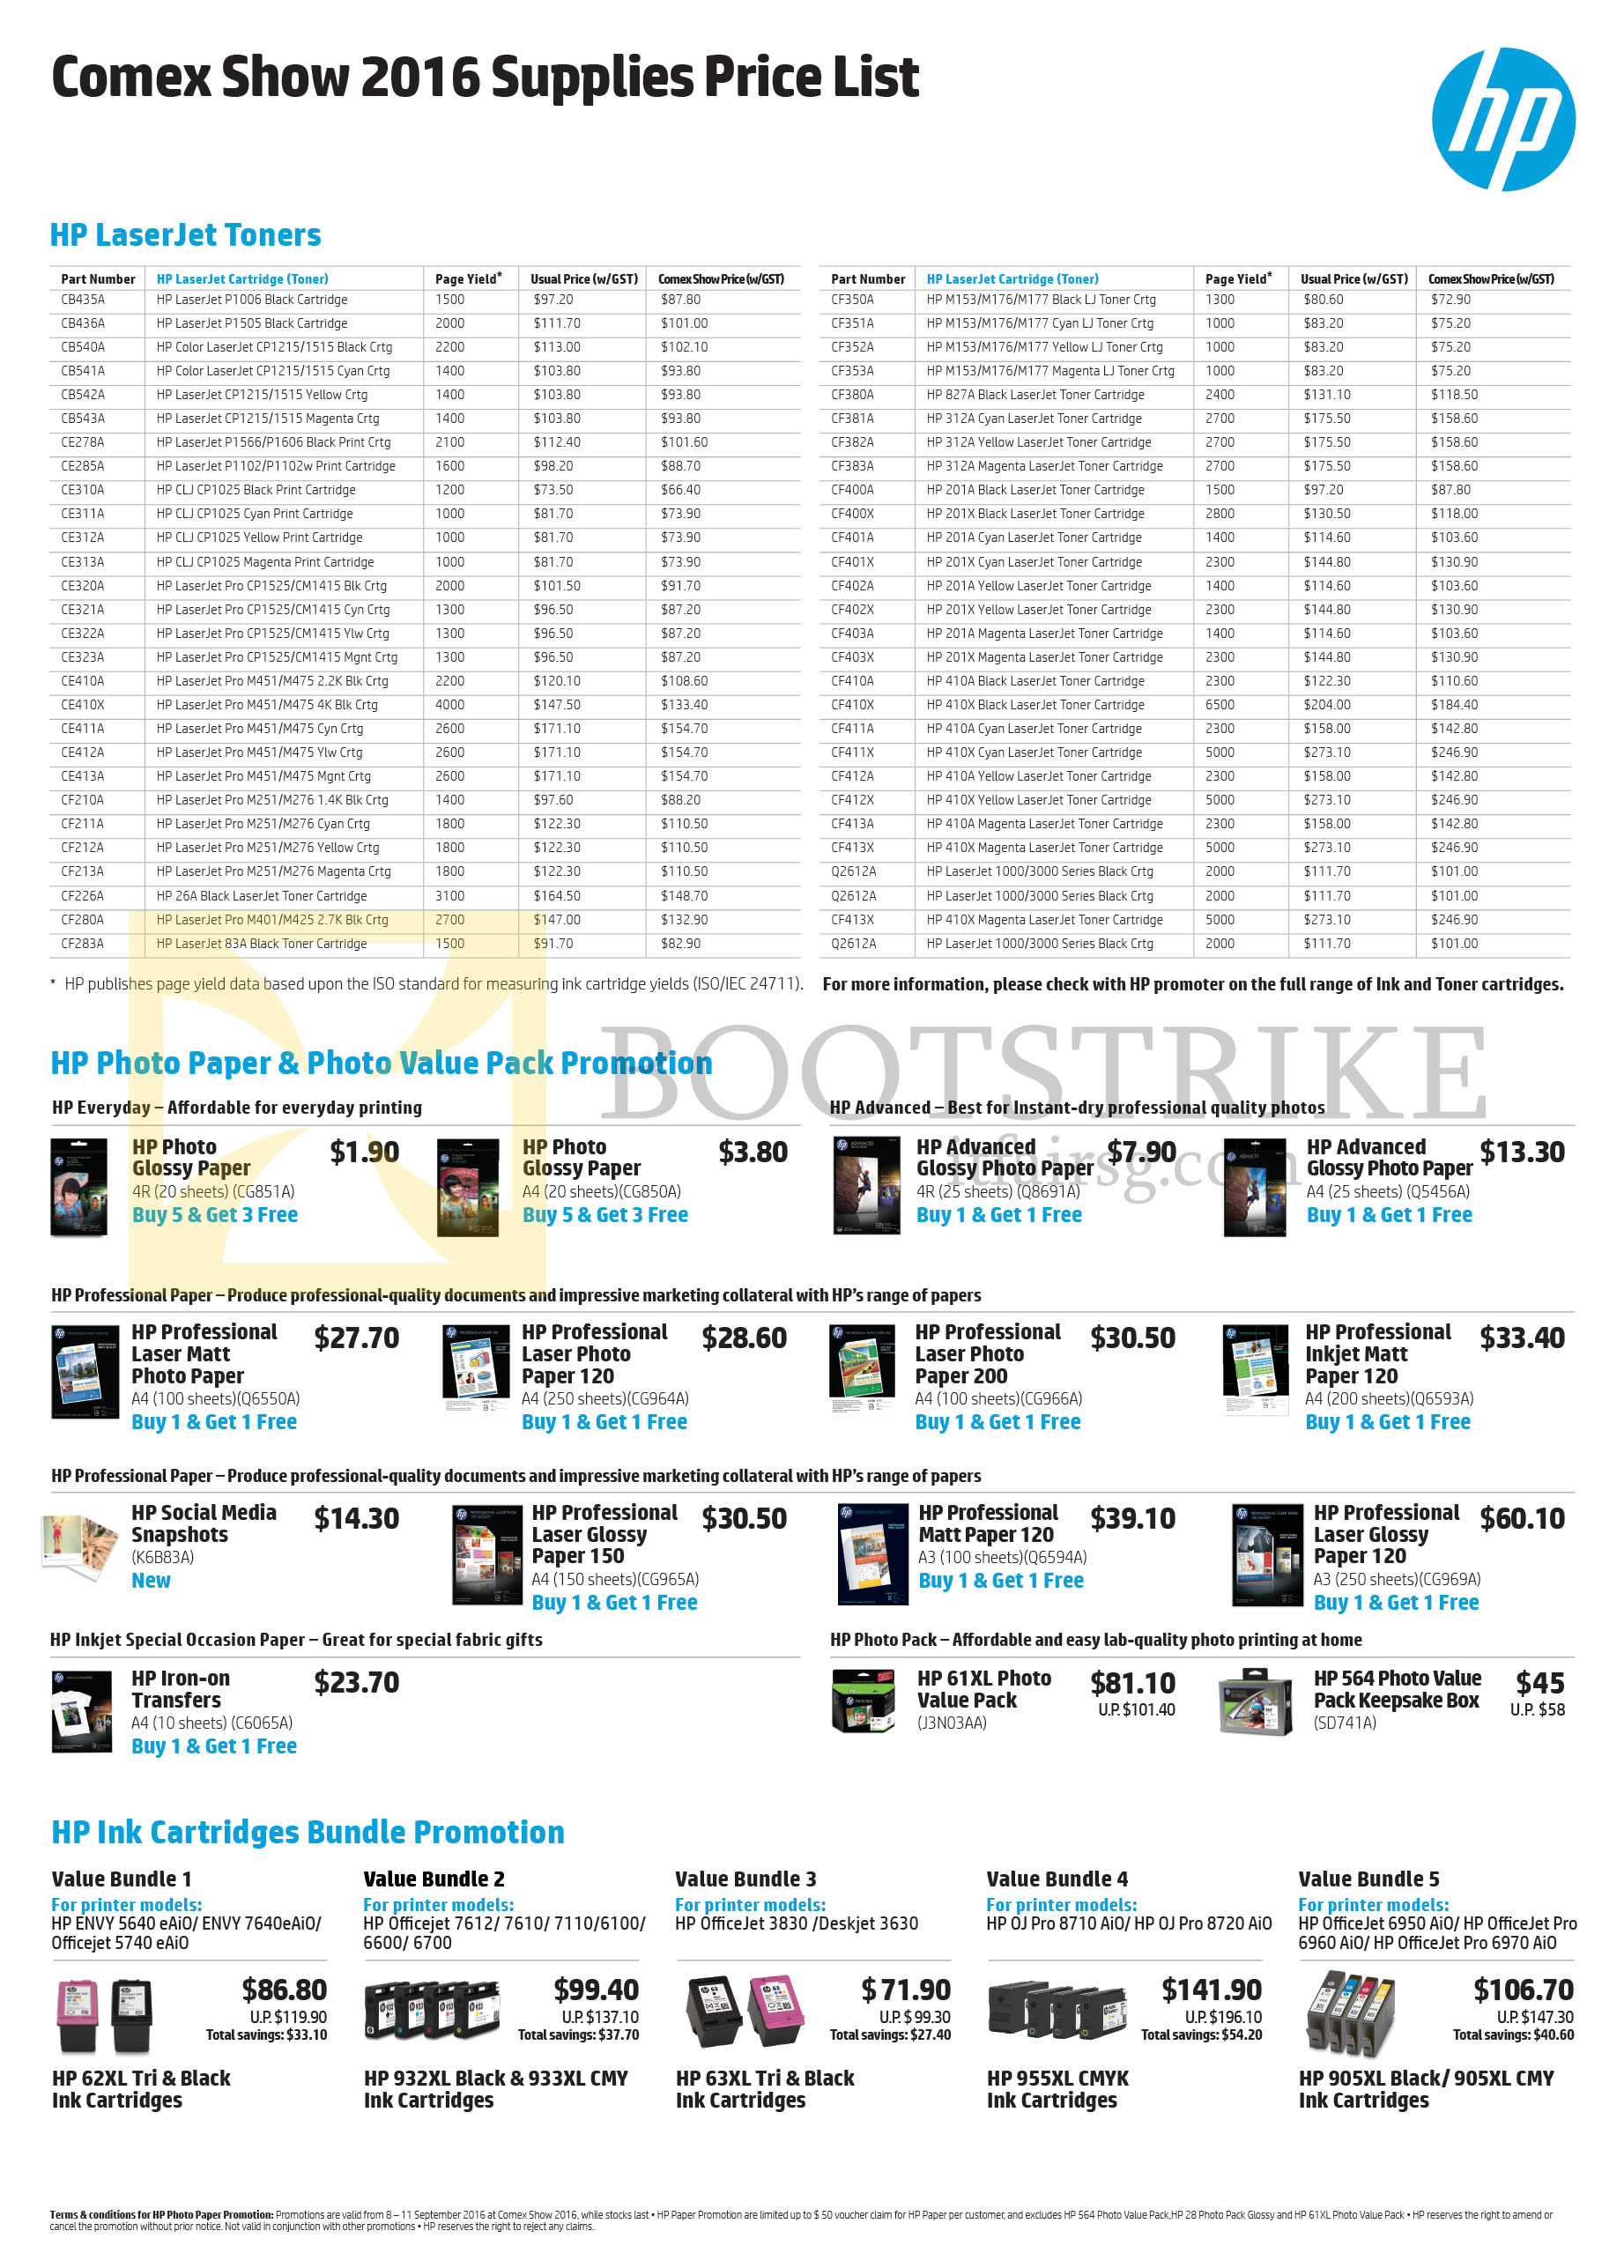 COMEX 2016 price list image brochure of HP Laserjet Toners, Photo Paper, Photo Value Pack, Ink Cartridges